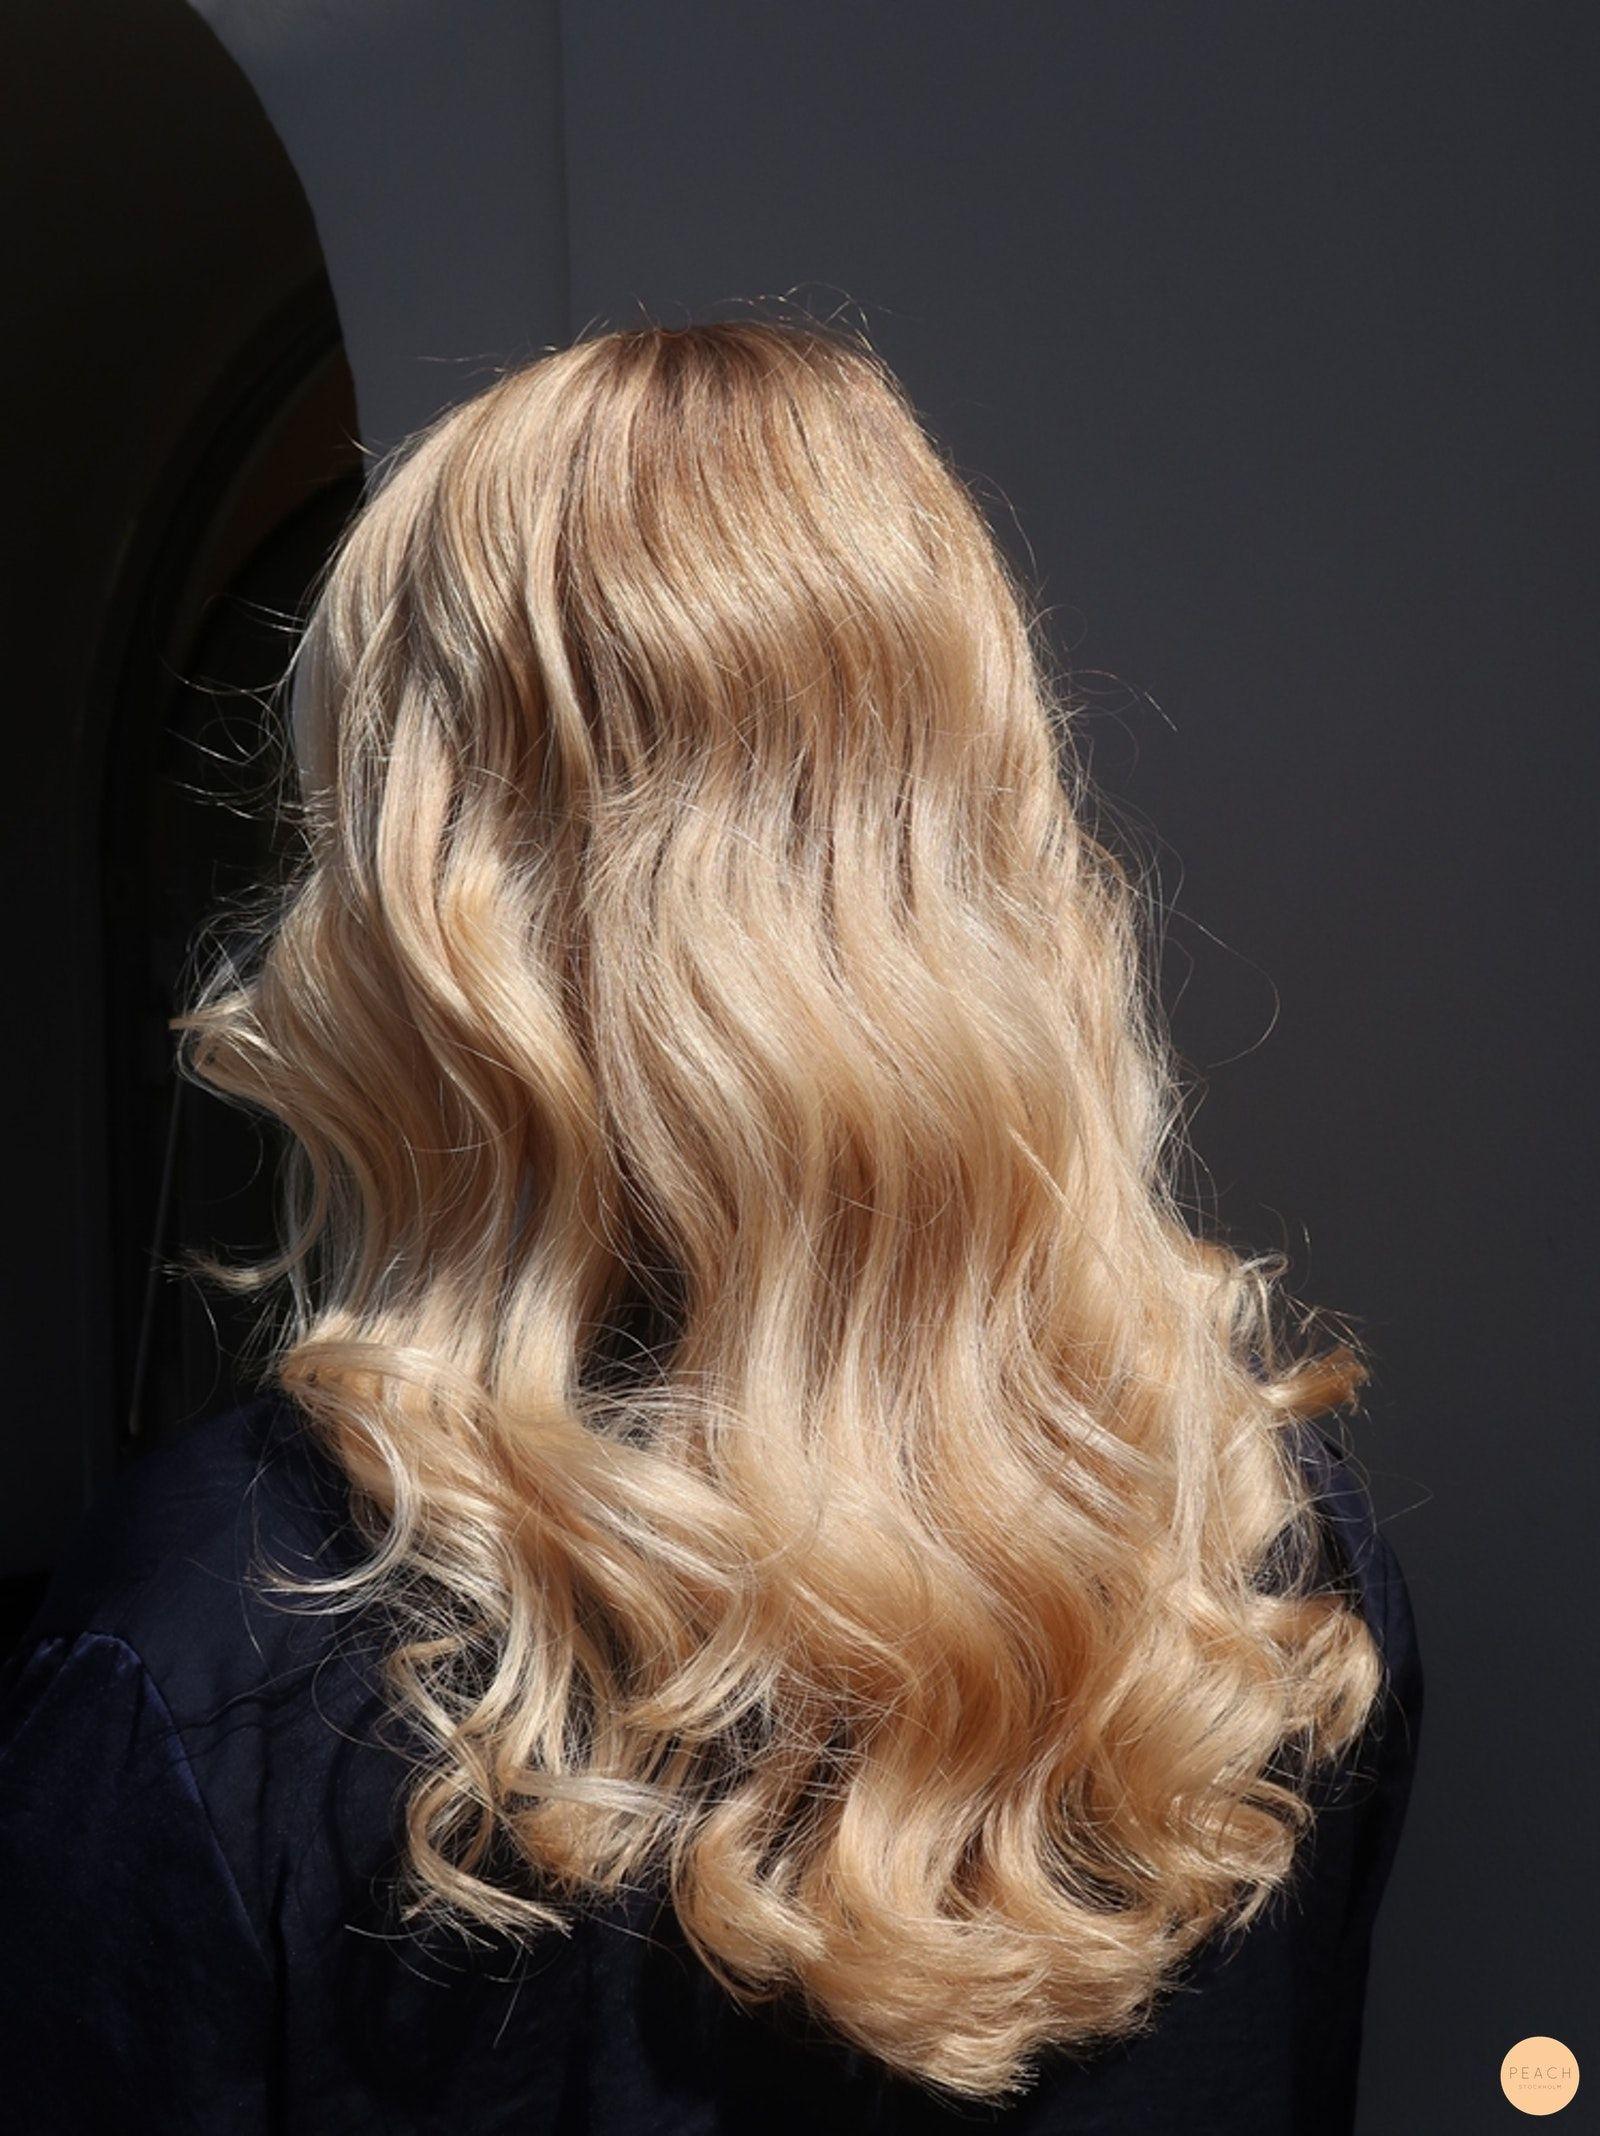 Rubia dorada lujosa – Melocotón Estocolmo   – 1b) Blonde – Varm och/eller guldi…